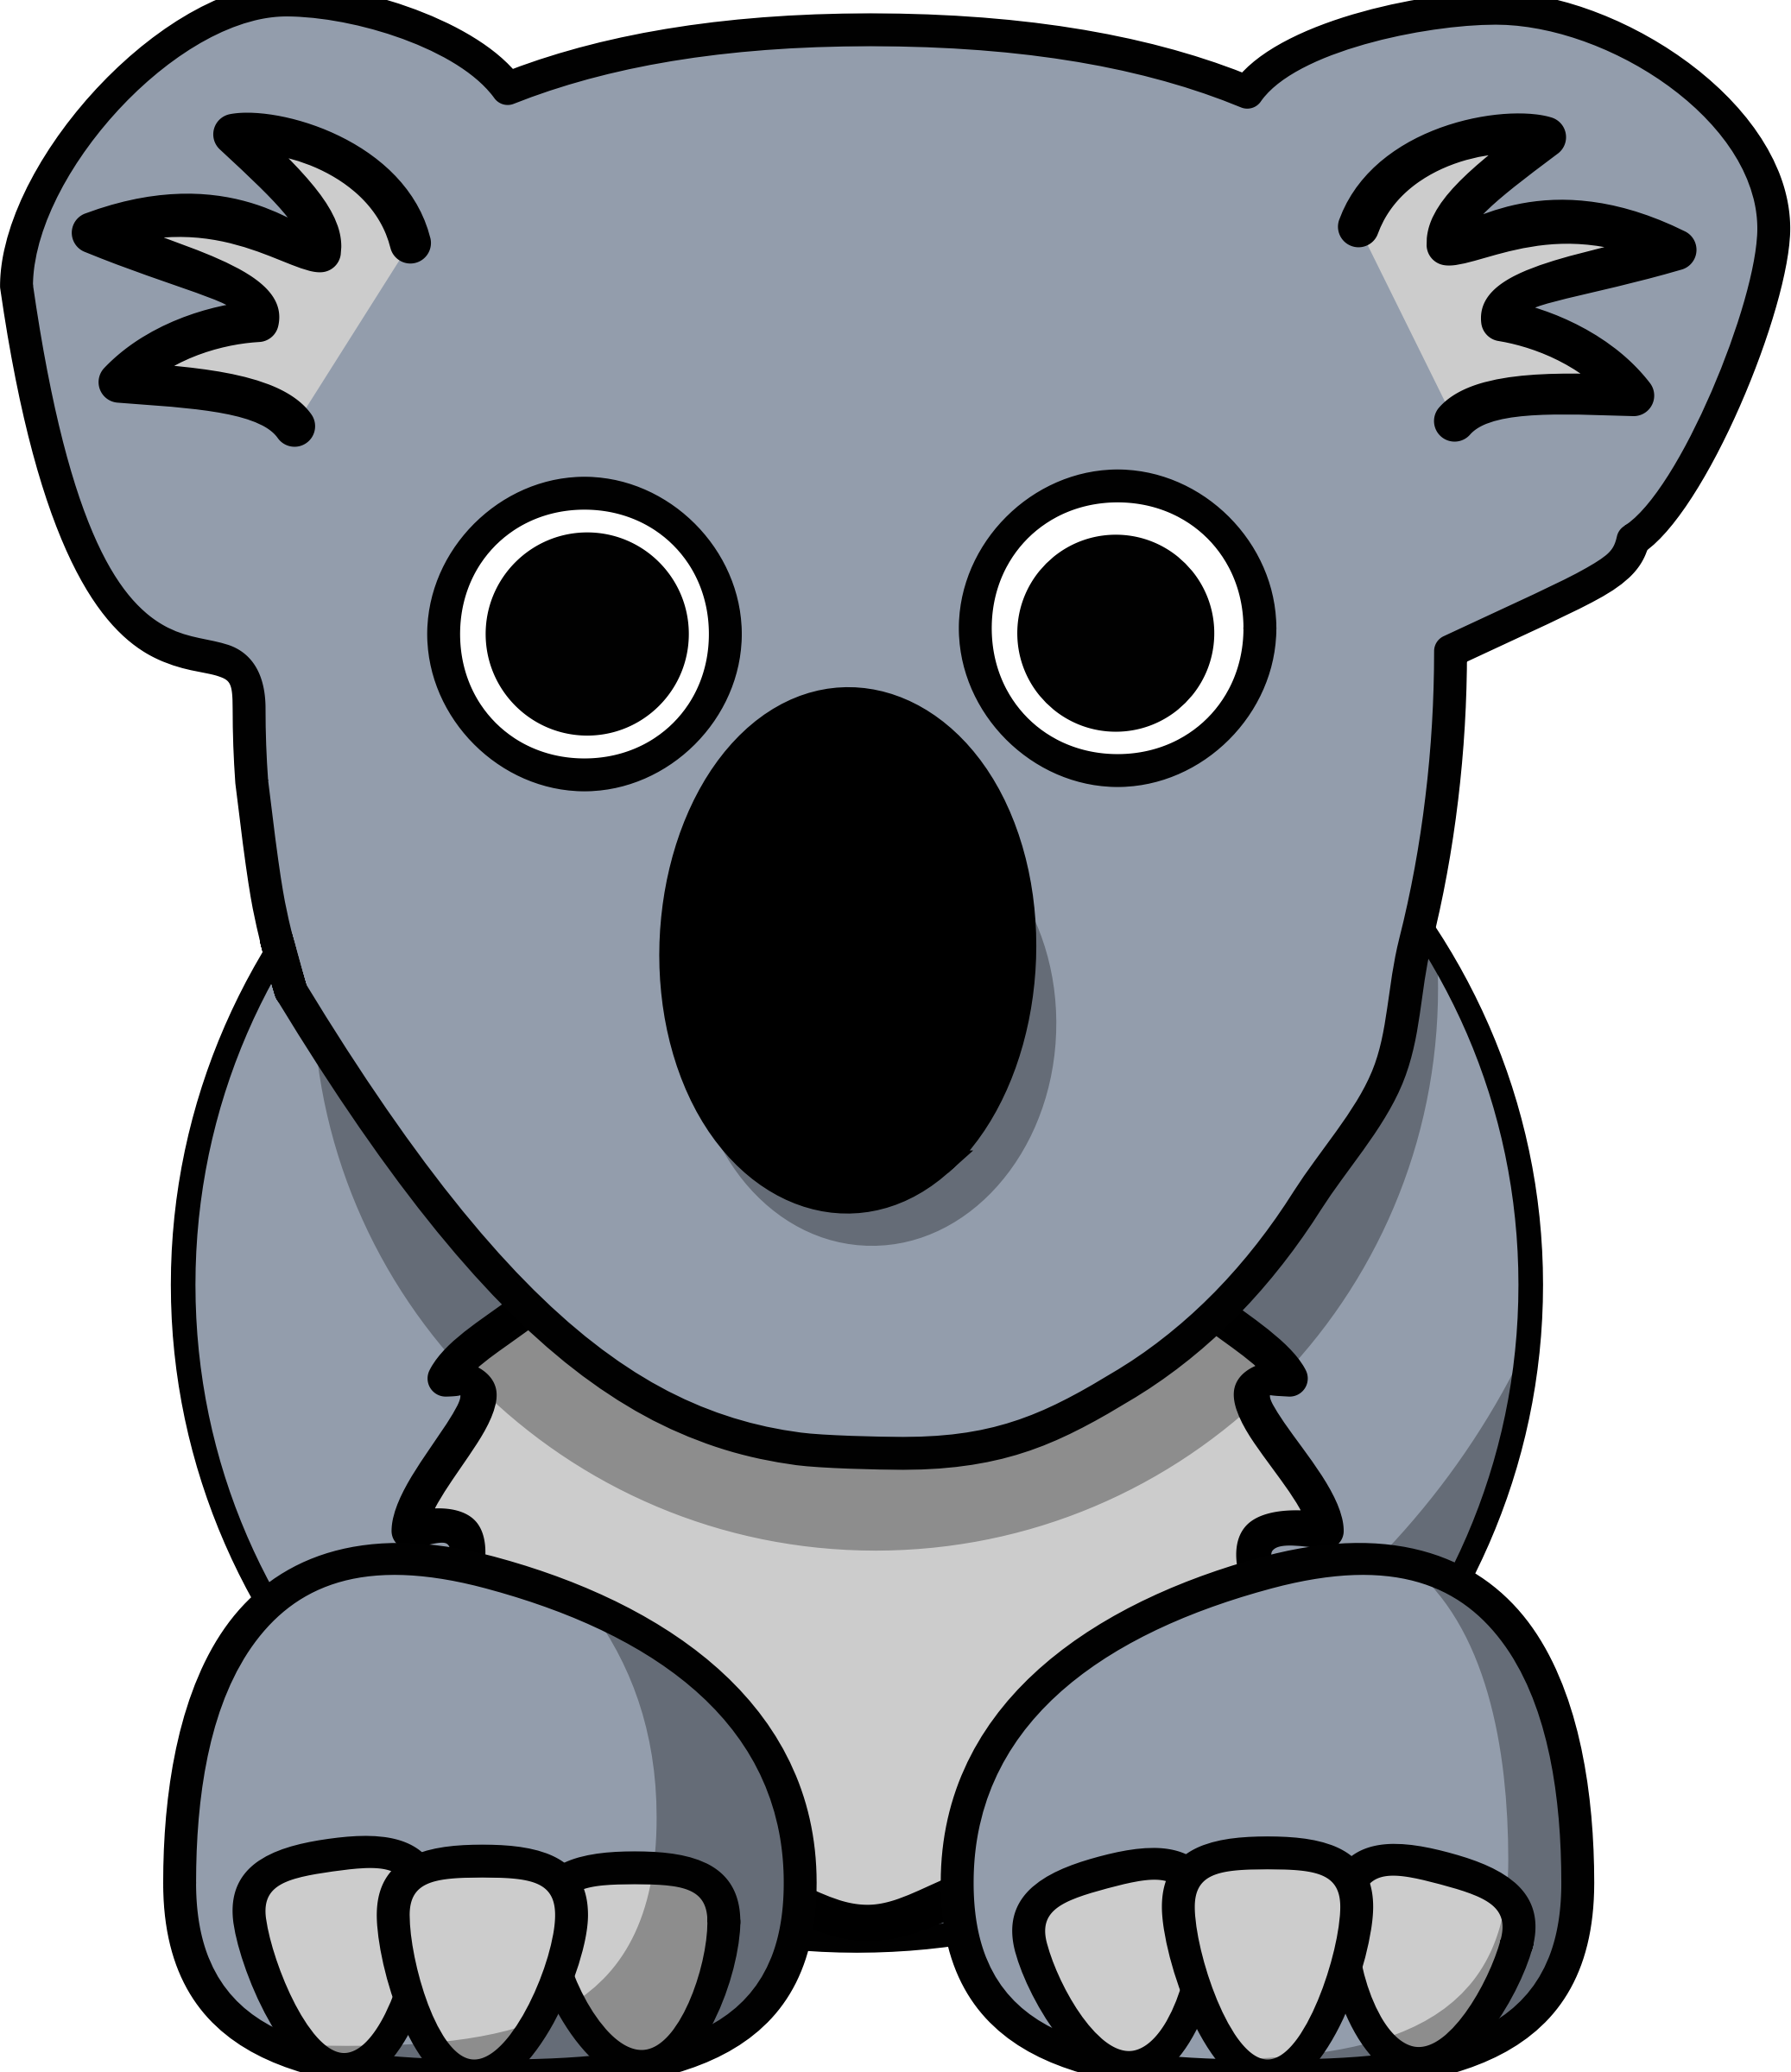 Koala clipart aussie. Cartoon big image png